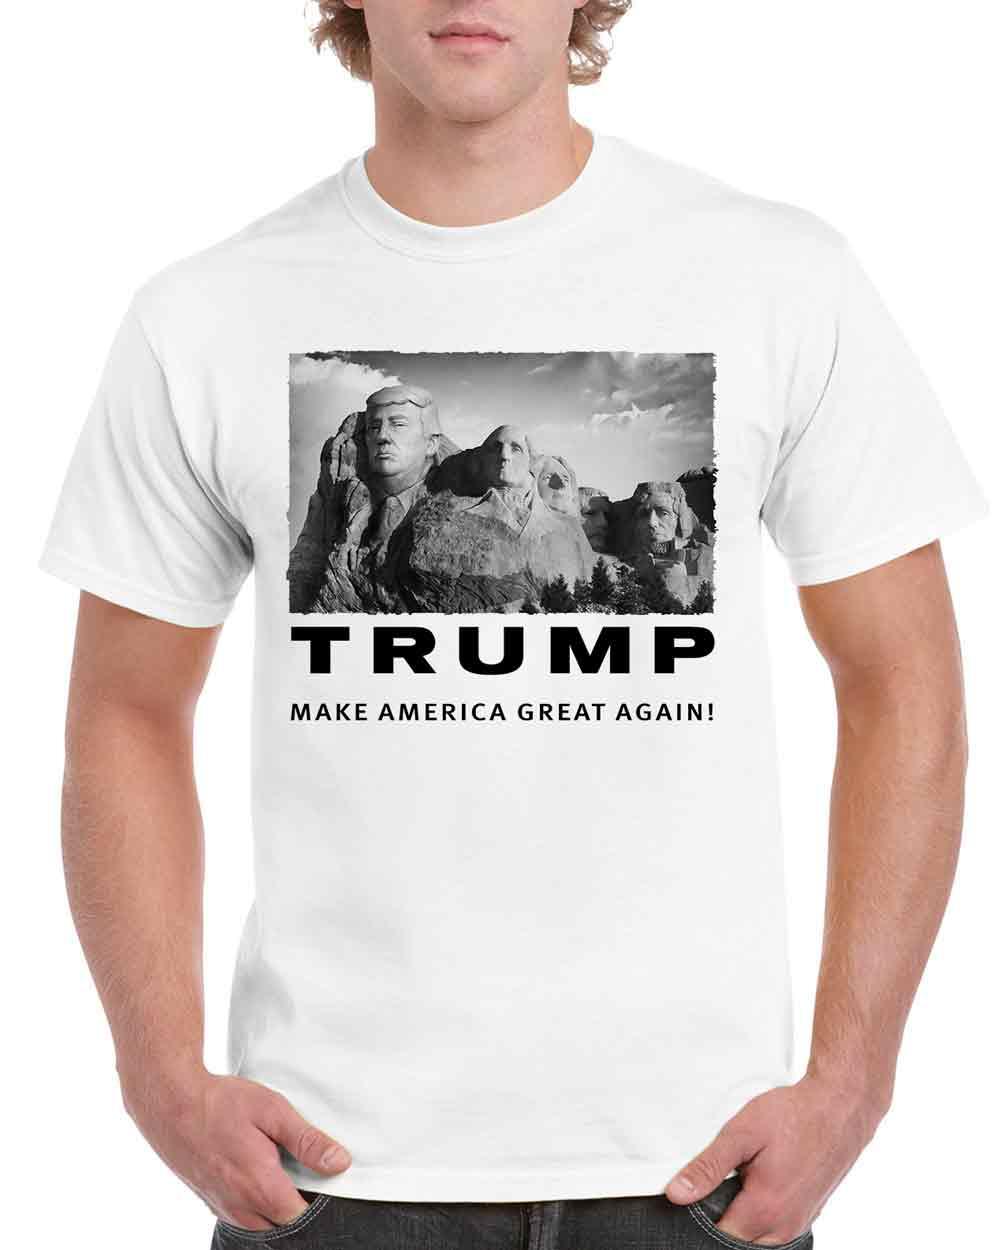 Make America Great Again Shirt Trump on Rushmore Mountain National Monuments Men's Tee